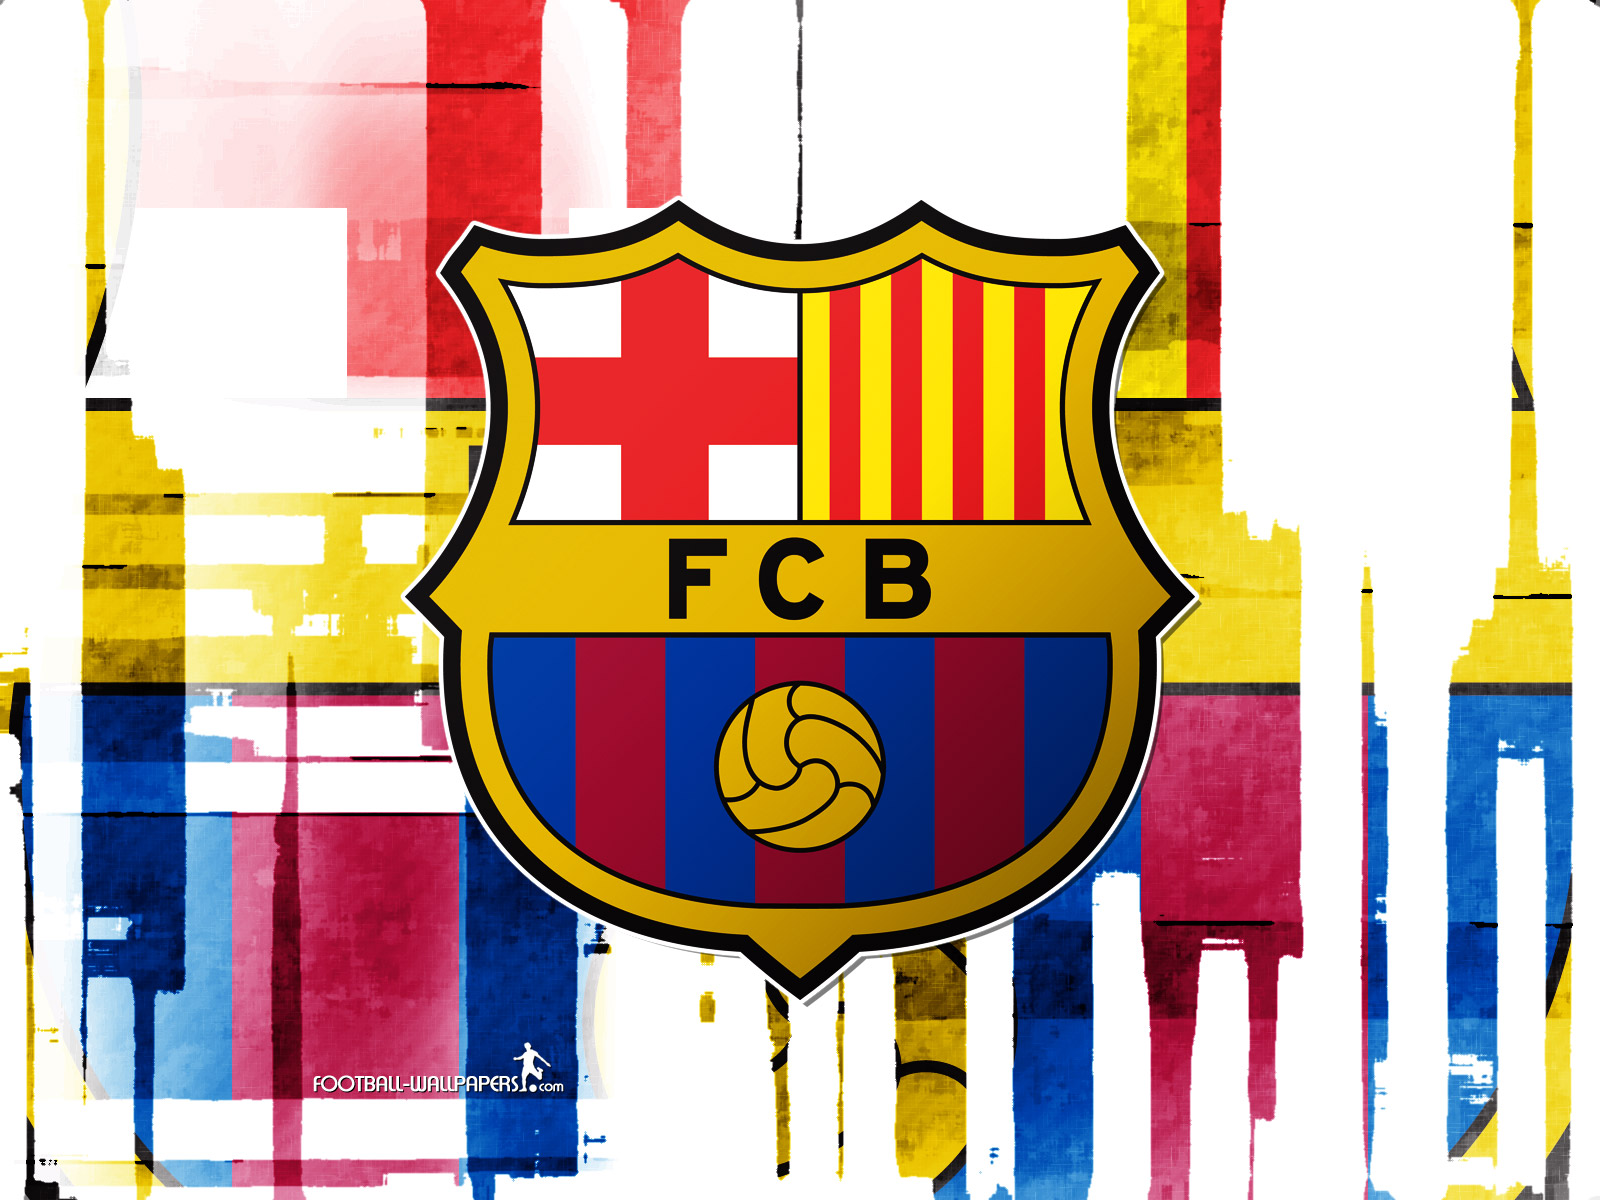 wallpaper free picture: FC Barcelona Wallpaper #Part1